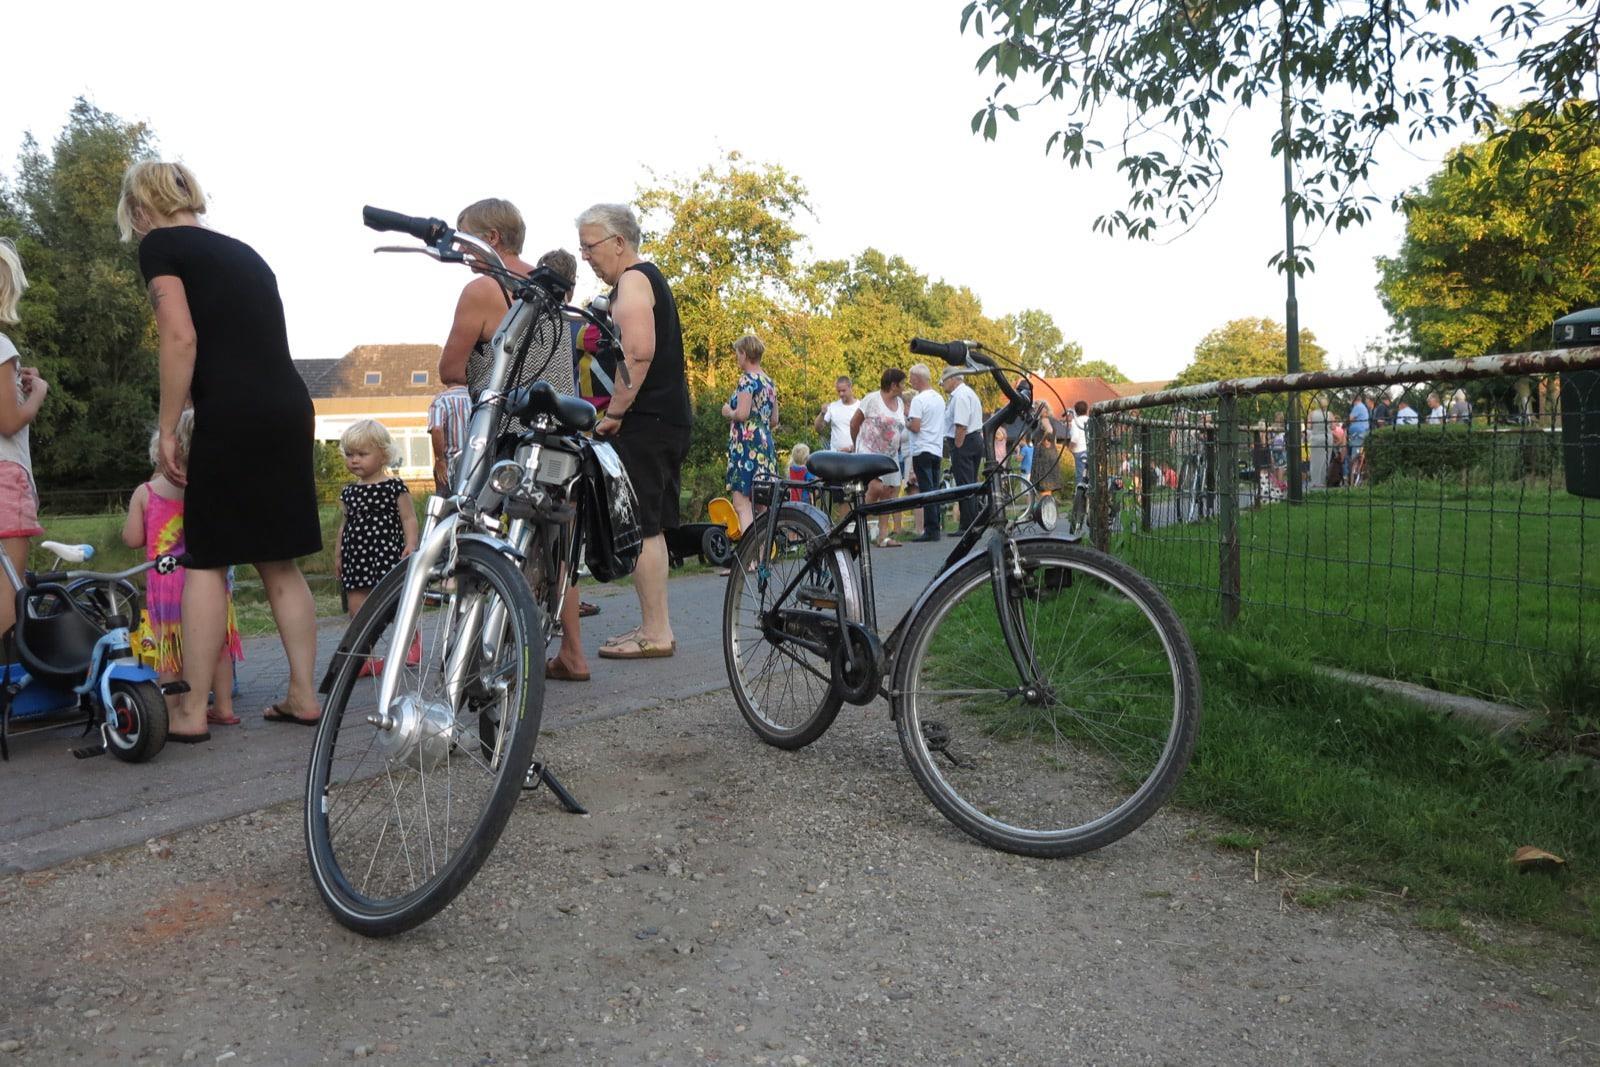 et-fiets-en-fietser-82-viswedstrijd-15-september-2016-oi.jpg